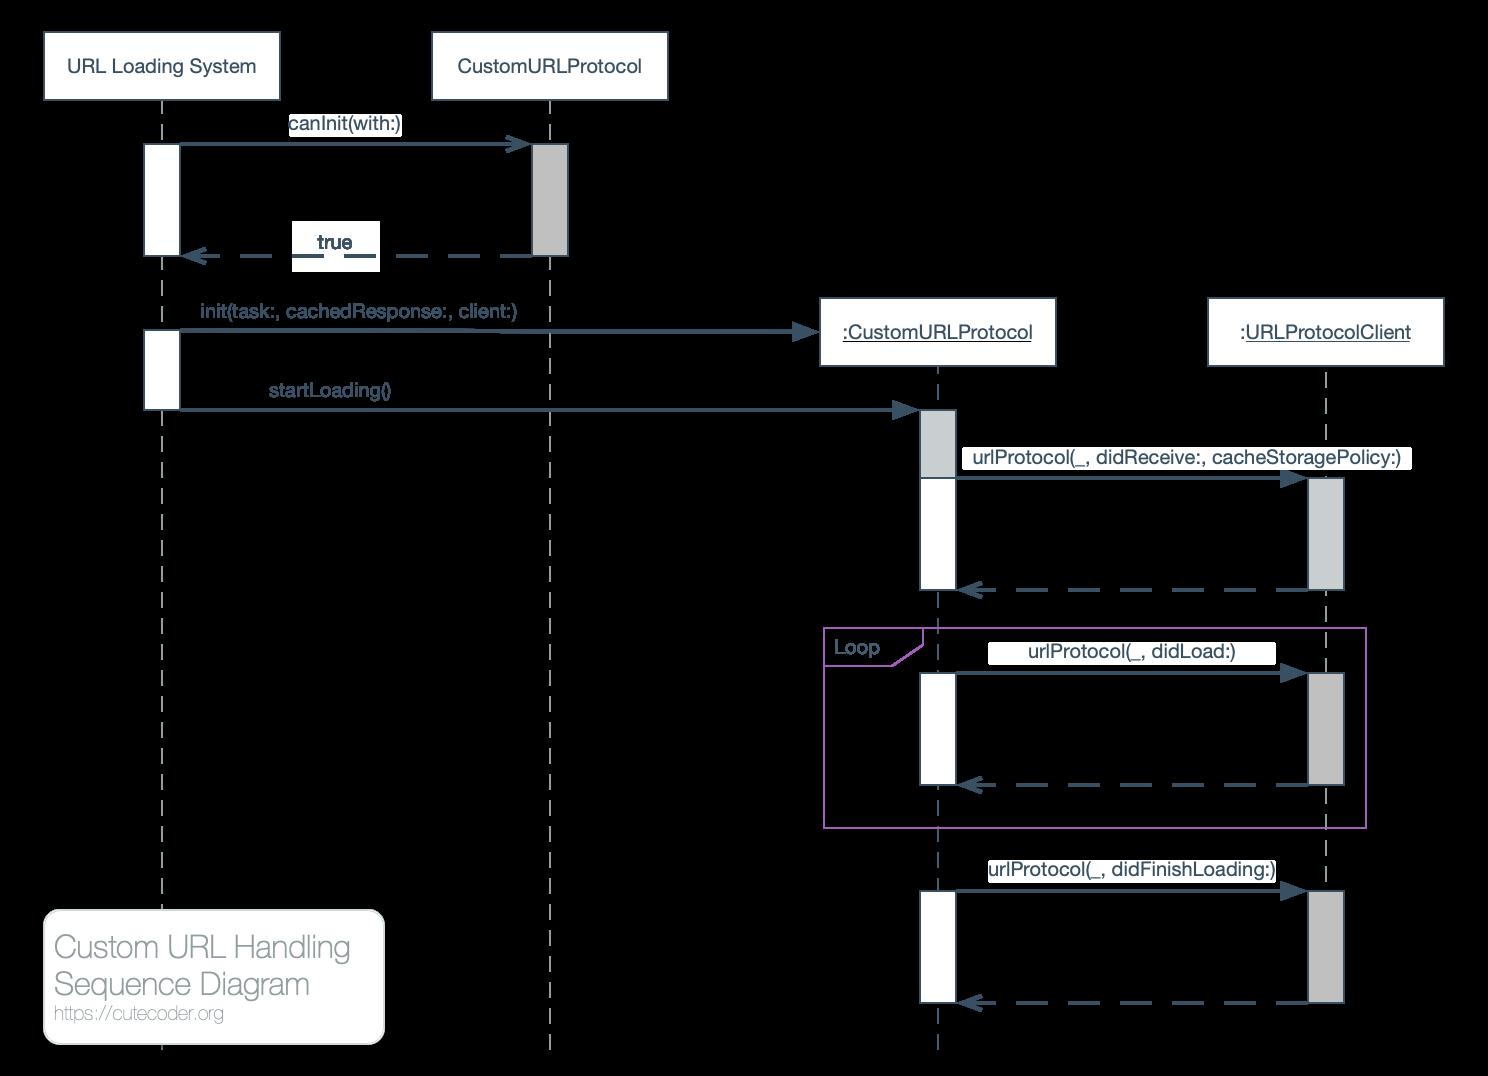 Custom URL Loading System